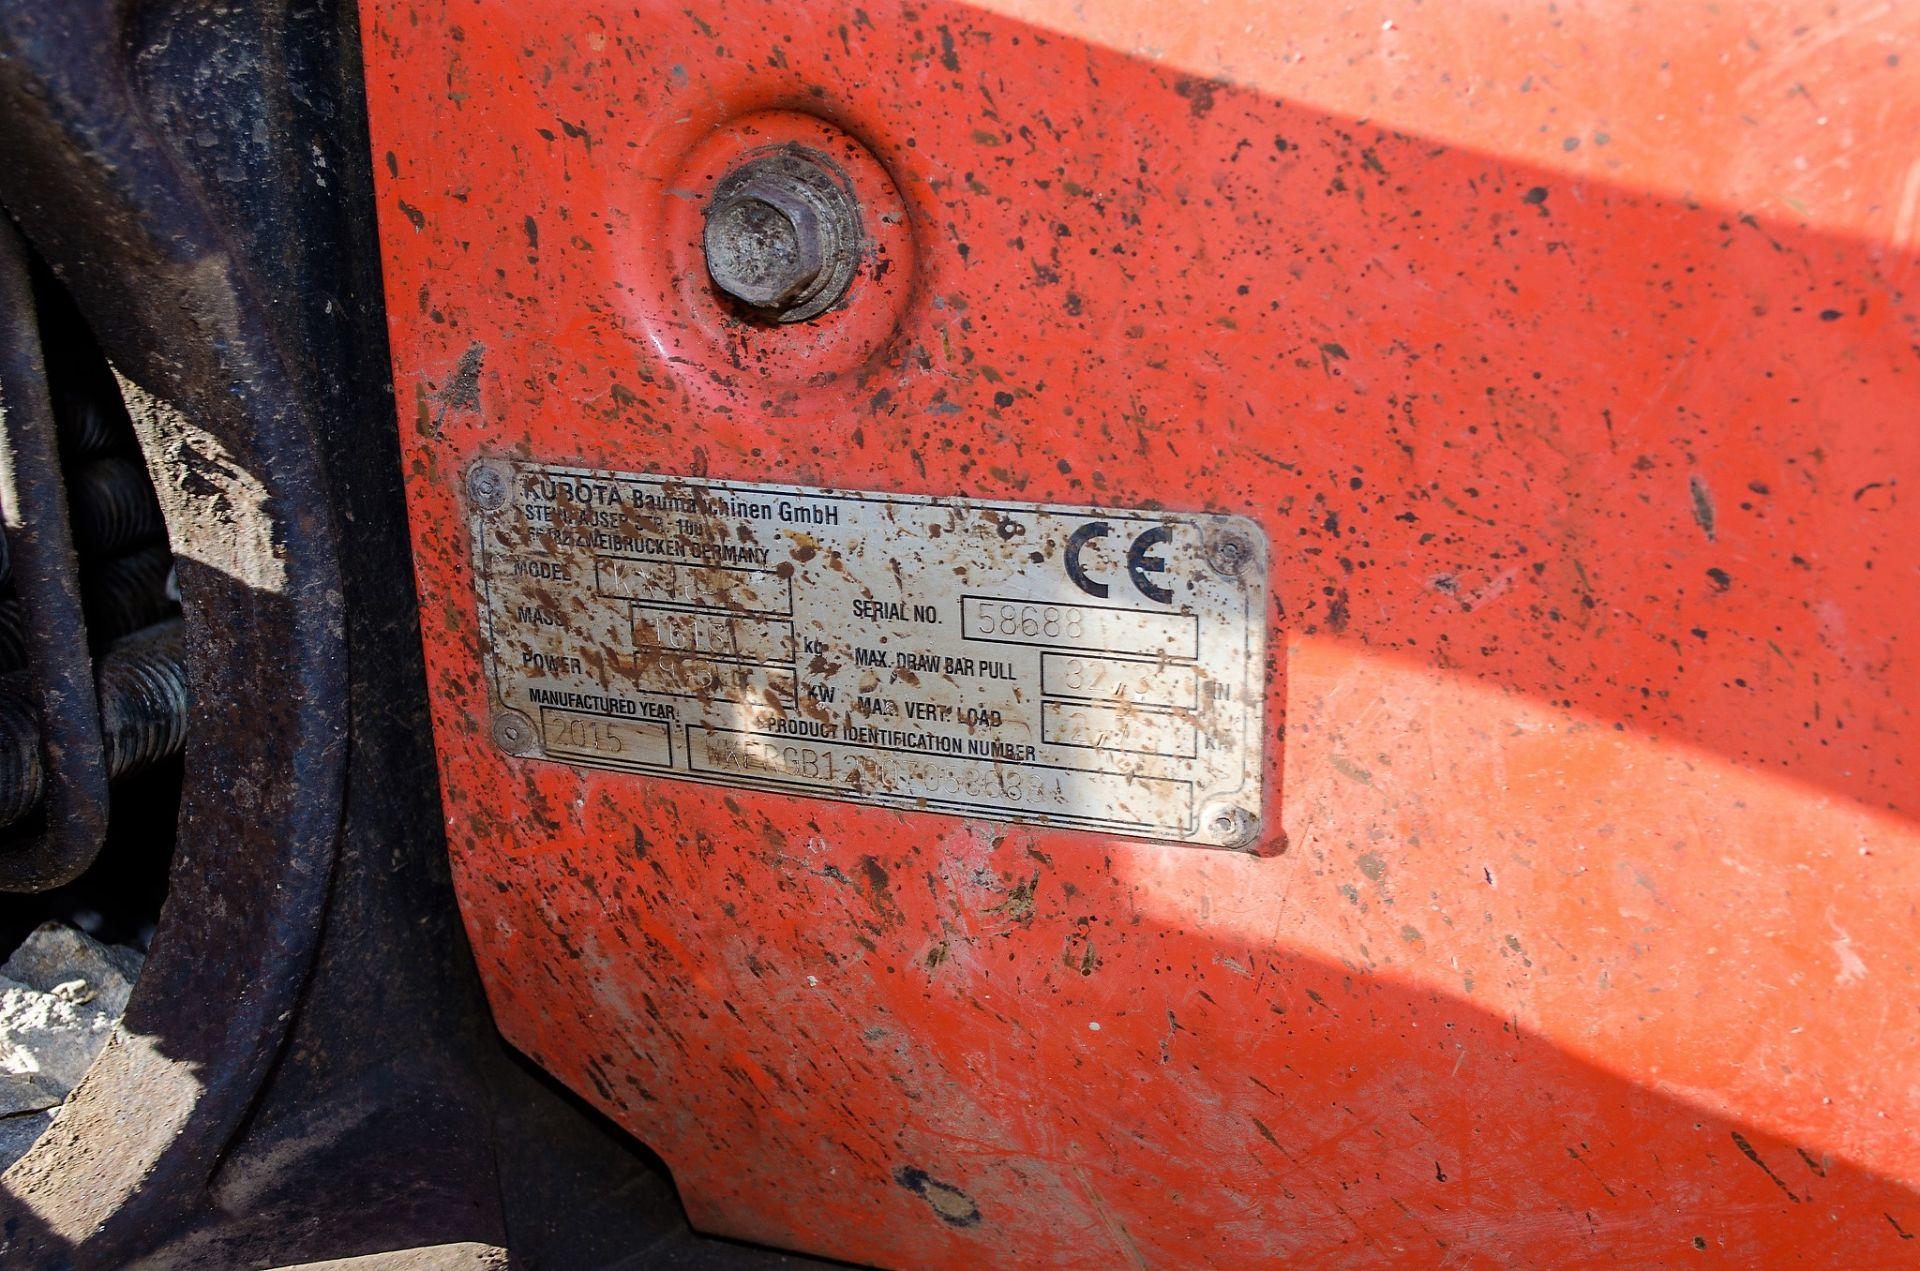 Kubota KX016-4 1.5 tonne rubber tracked mini excavator Year: 2015 S/N: 58688 Recorded Hours: 1736 - Image 19 of 19